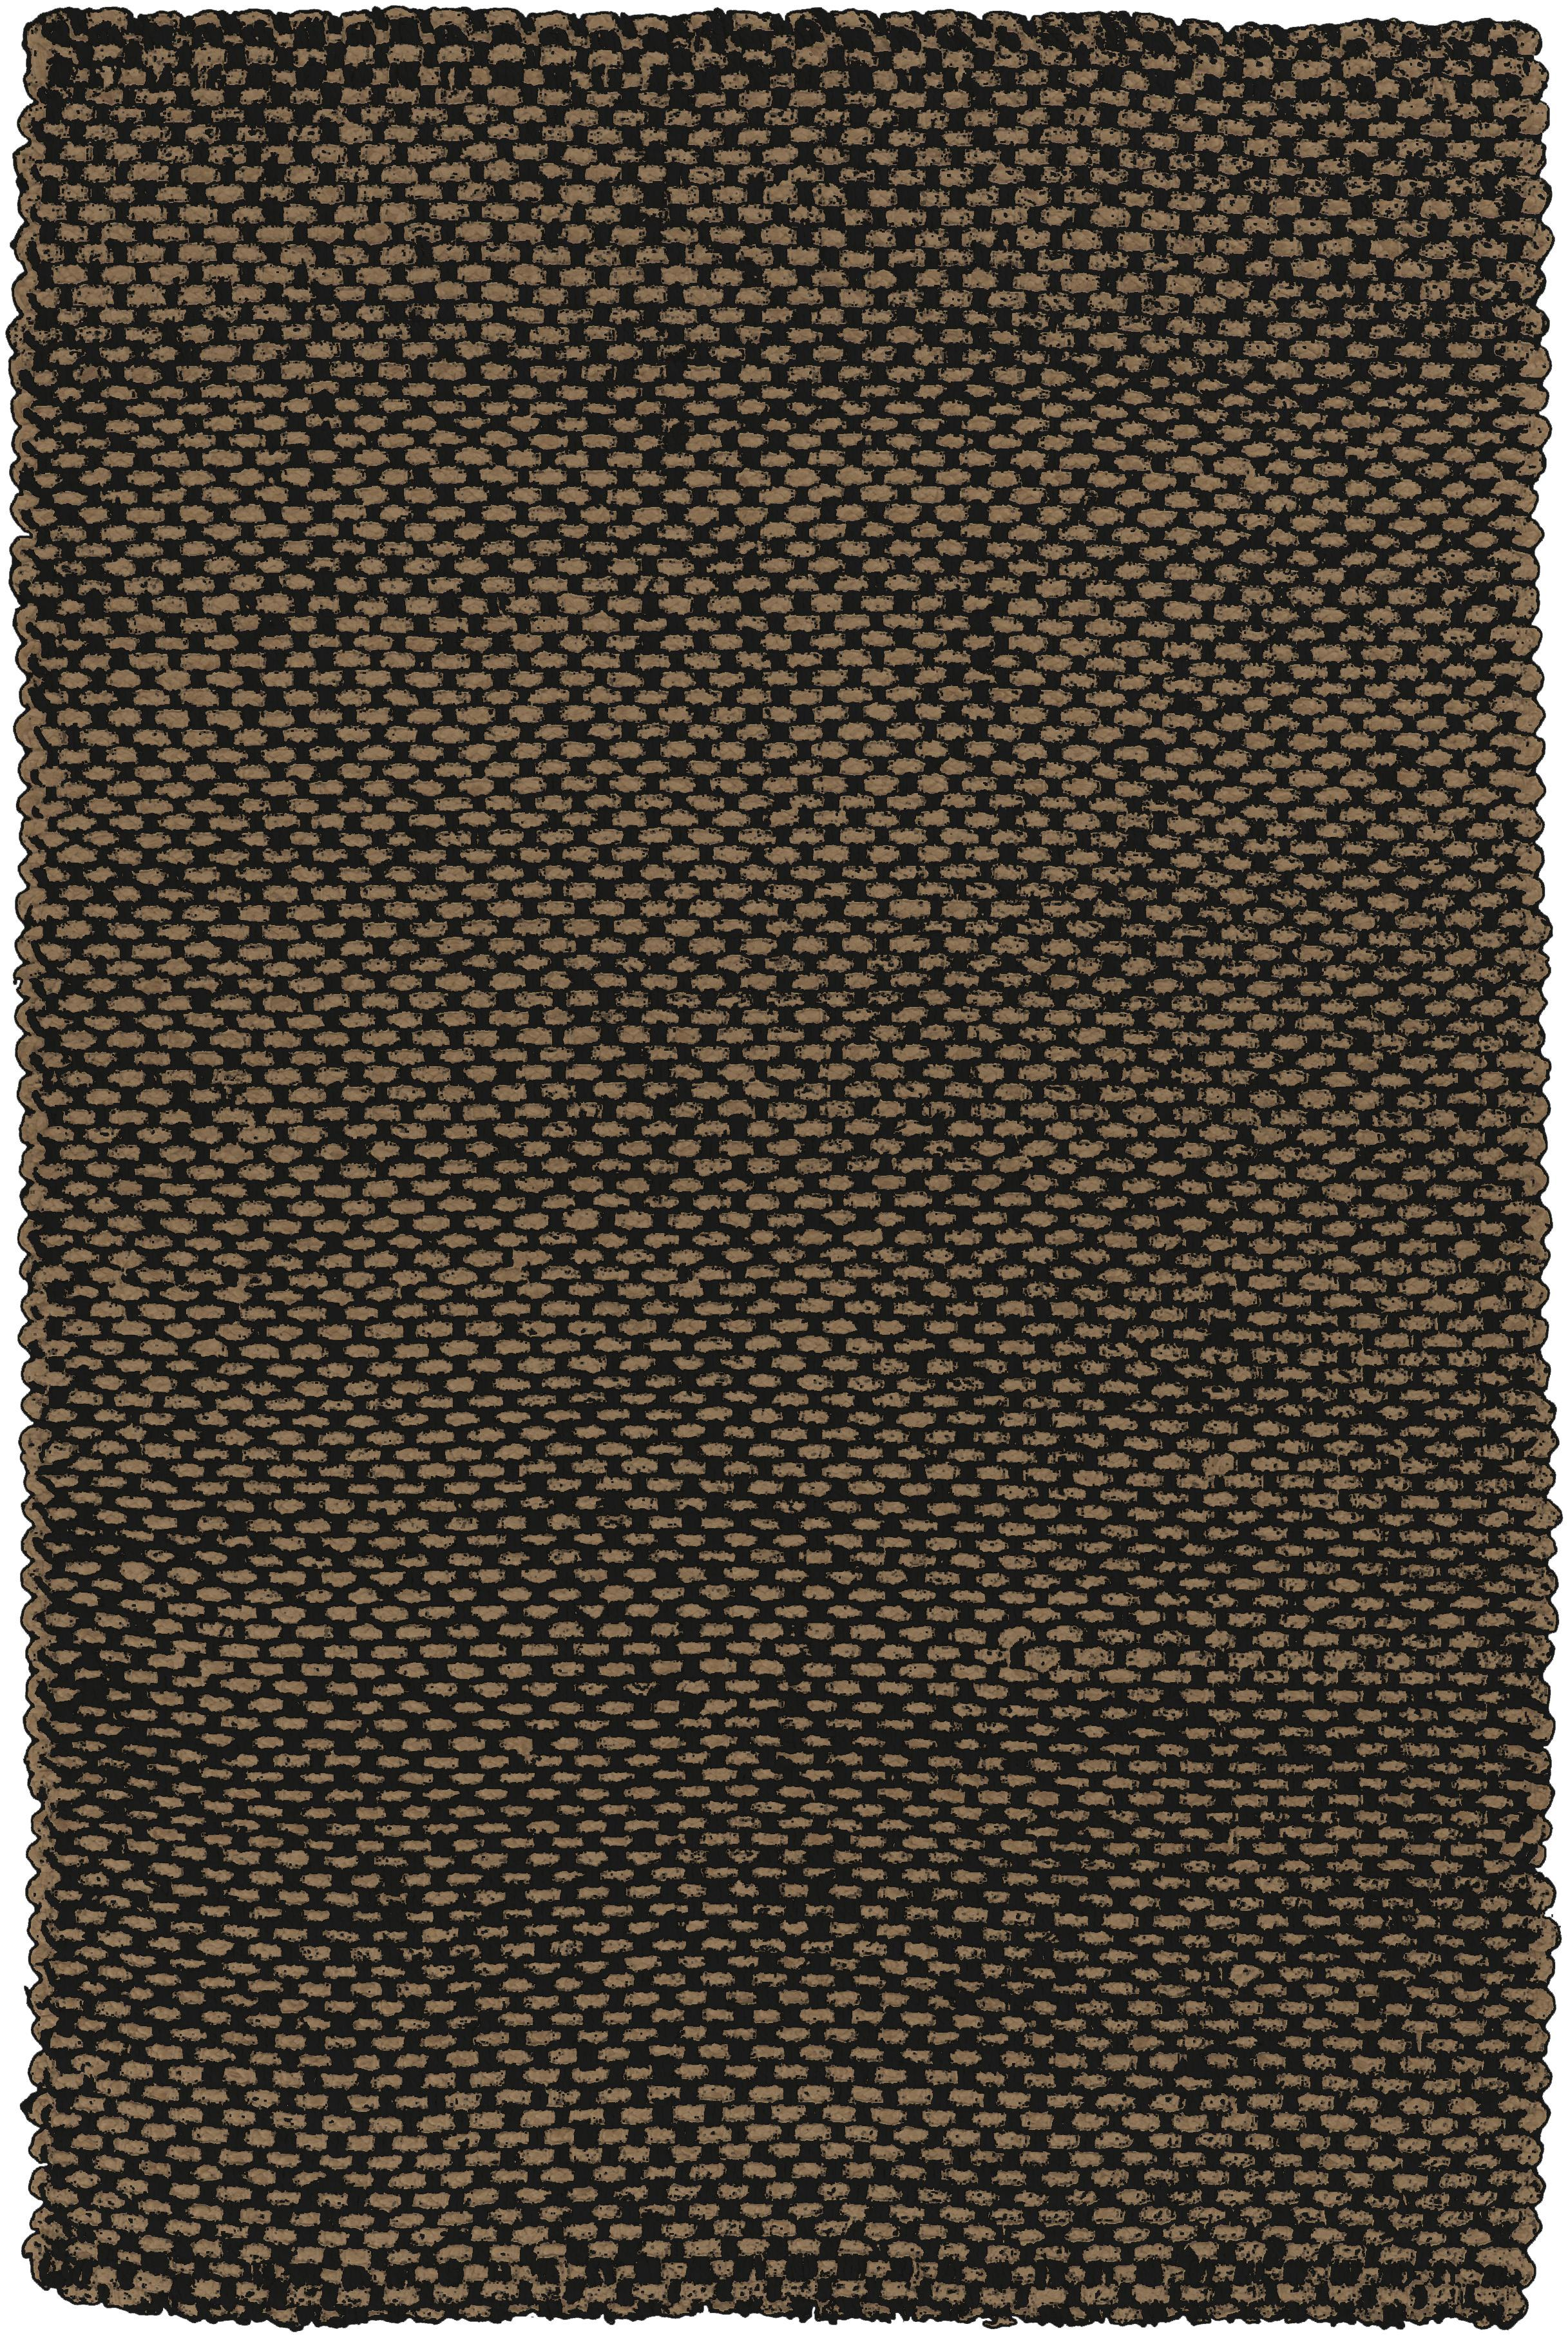 Surya Reeds 5' x 8' - Item Number: REED826-58